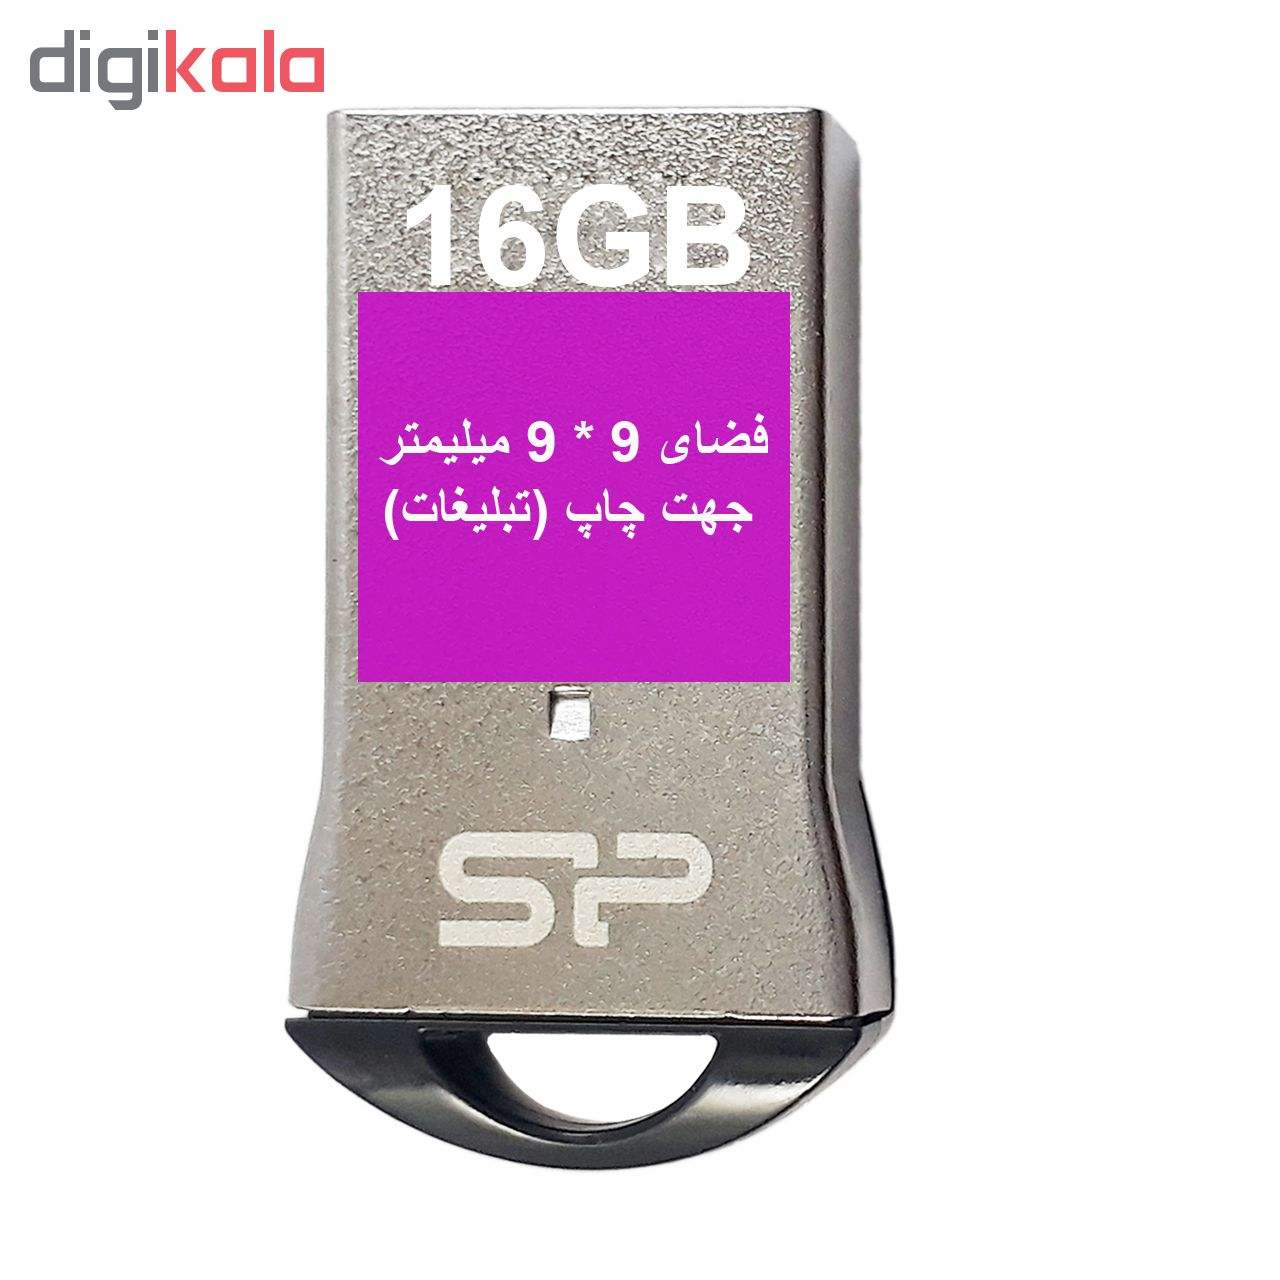 فلش مموری سیلیکون پاور مدل Touch T01 ظرفیت 16 گیگابایت main 1 4